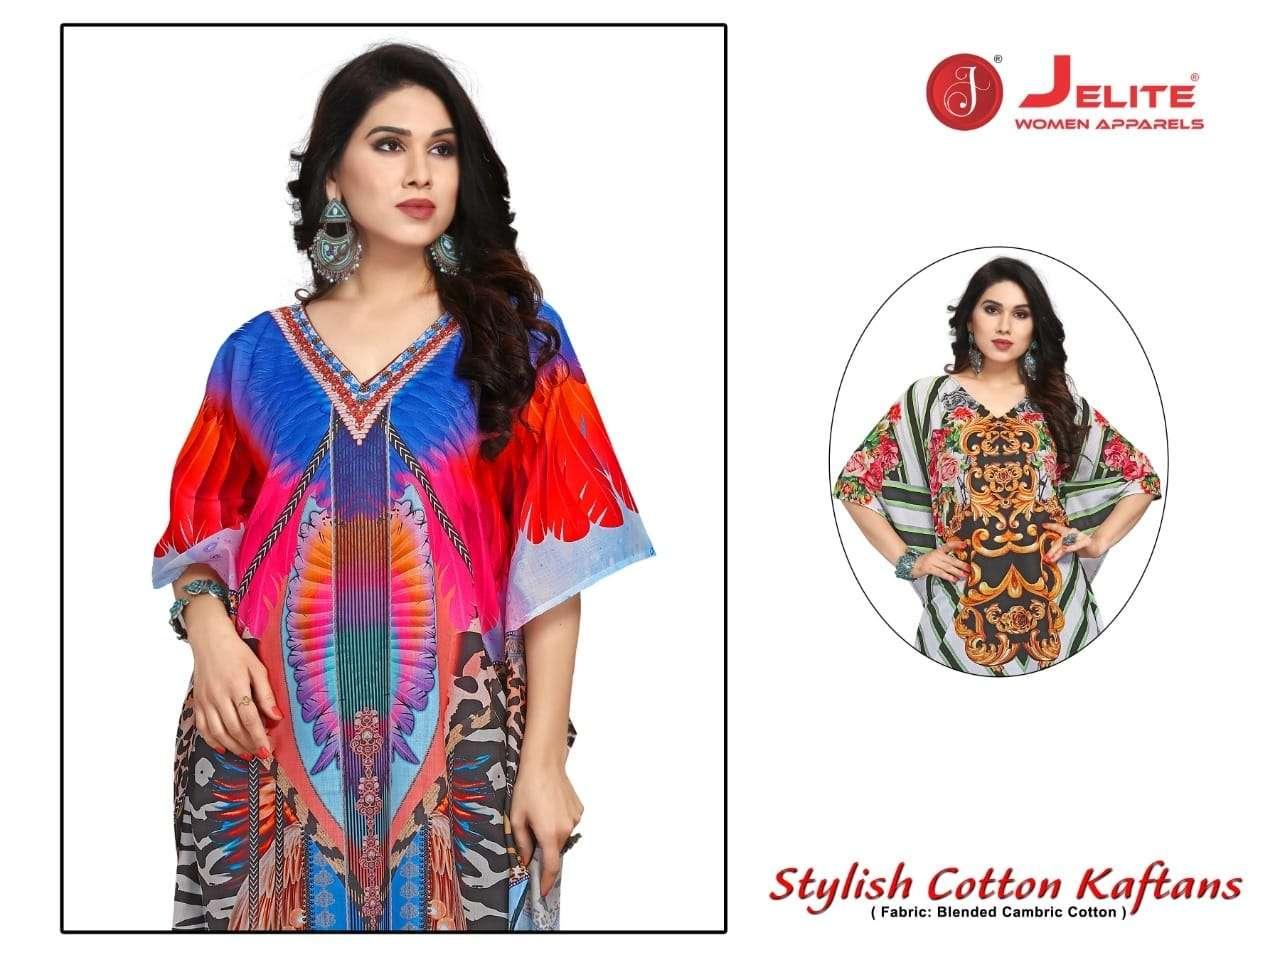 Jelite Stylish Cotton kaftan Exclusive Digital Printed Kaftan catalog Wholesaler